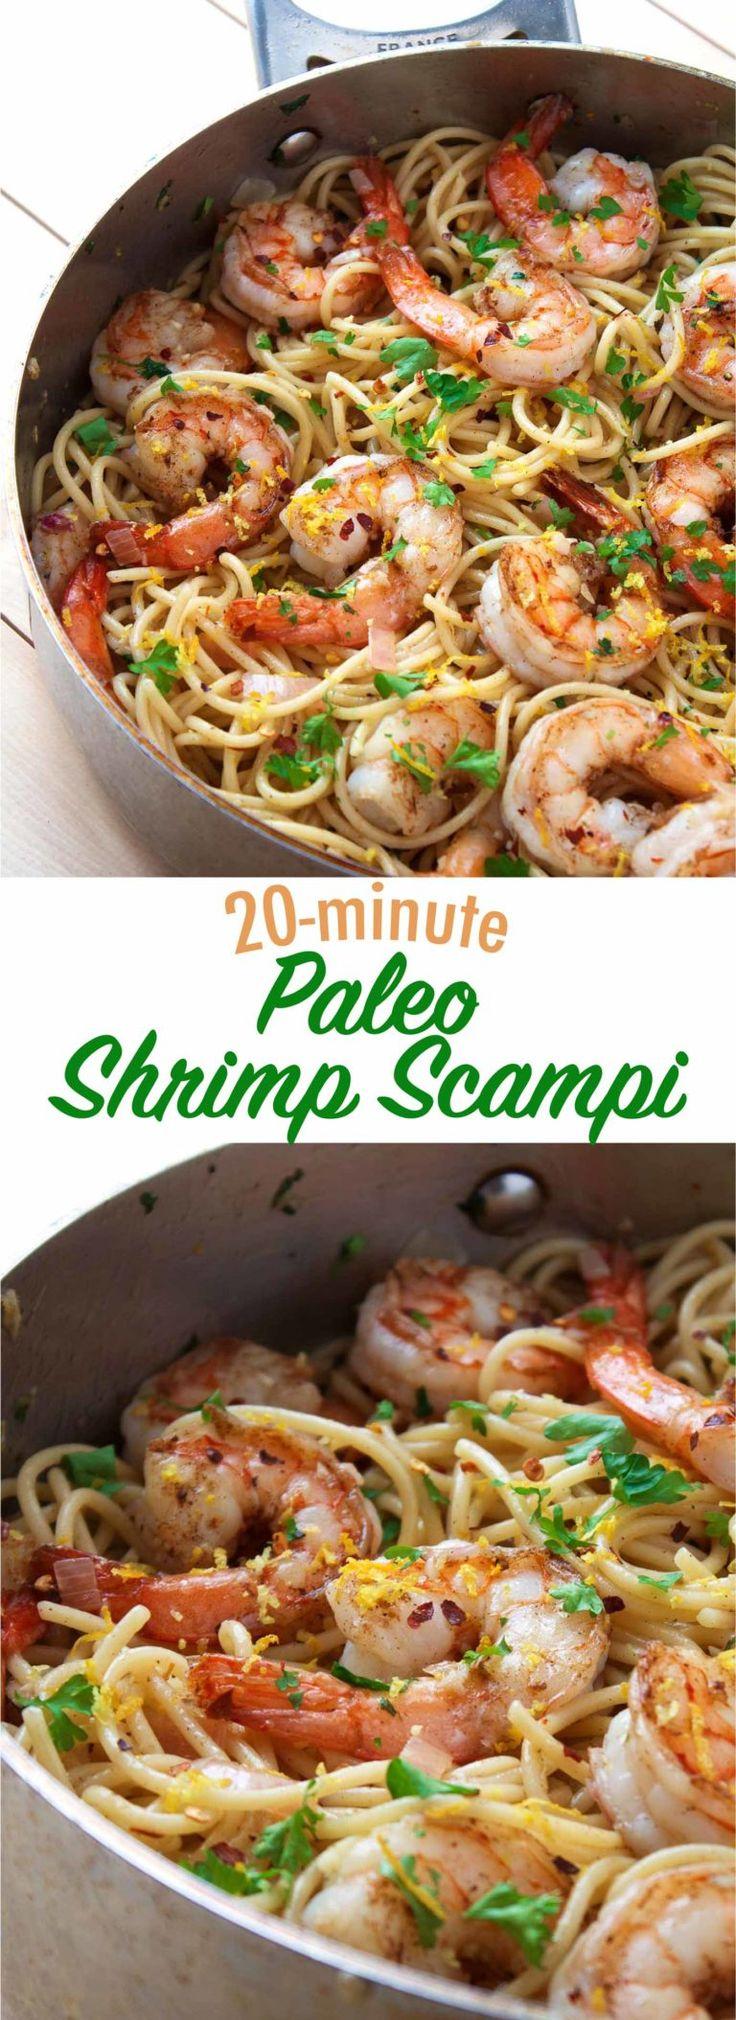 20-Minute Paleo Shrimp Scampi | Kit's Coastal | #kitscoastal #coastalpaleo #pale…